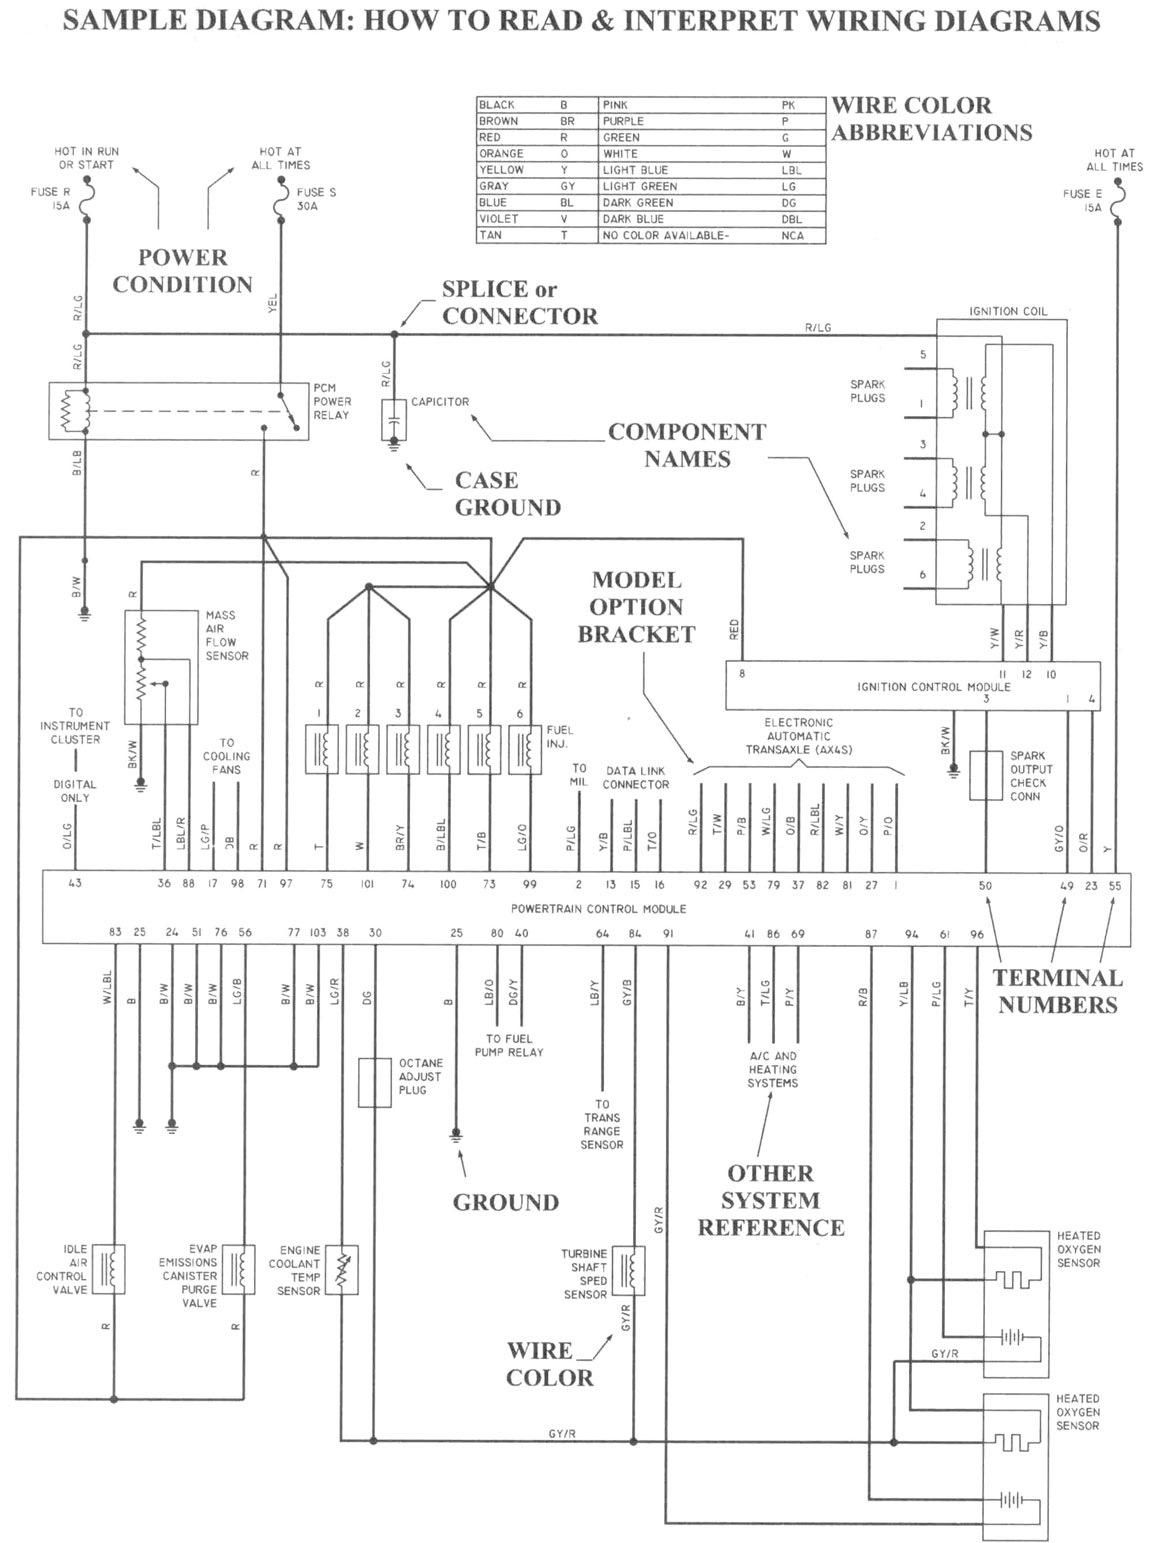 Sample Diagram Lq1 34 Pontiac Grand Interpreting Wiring Diagrams How To Read And Interpret